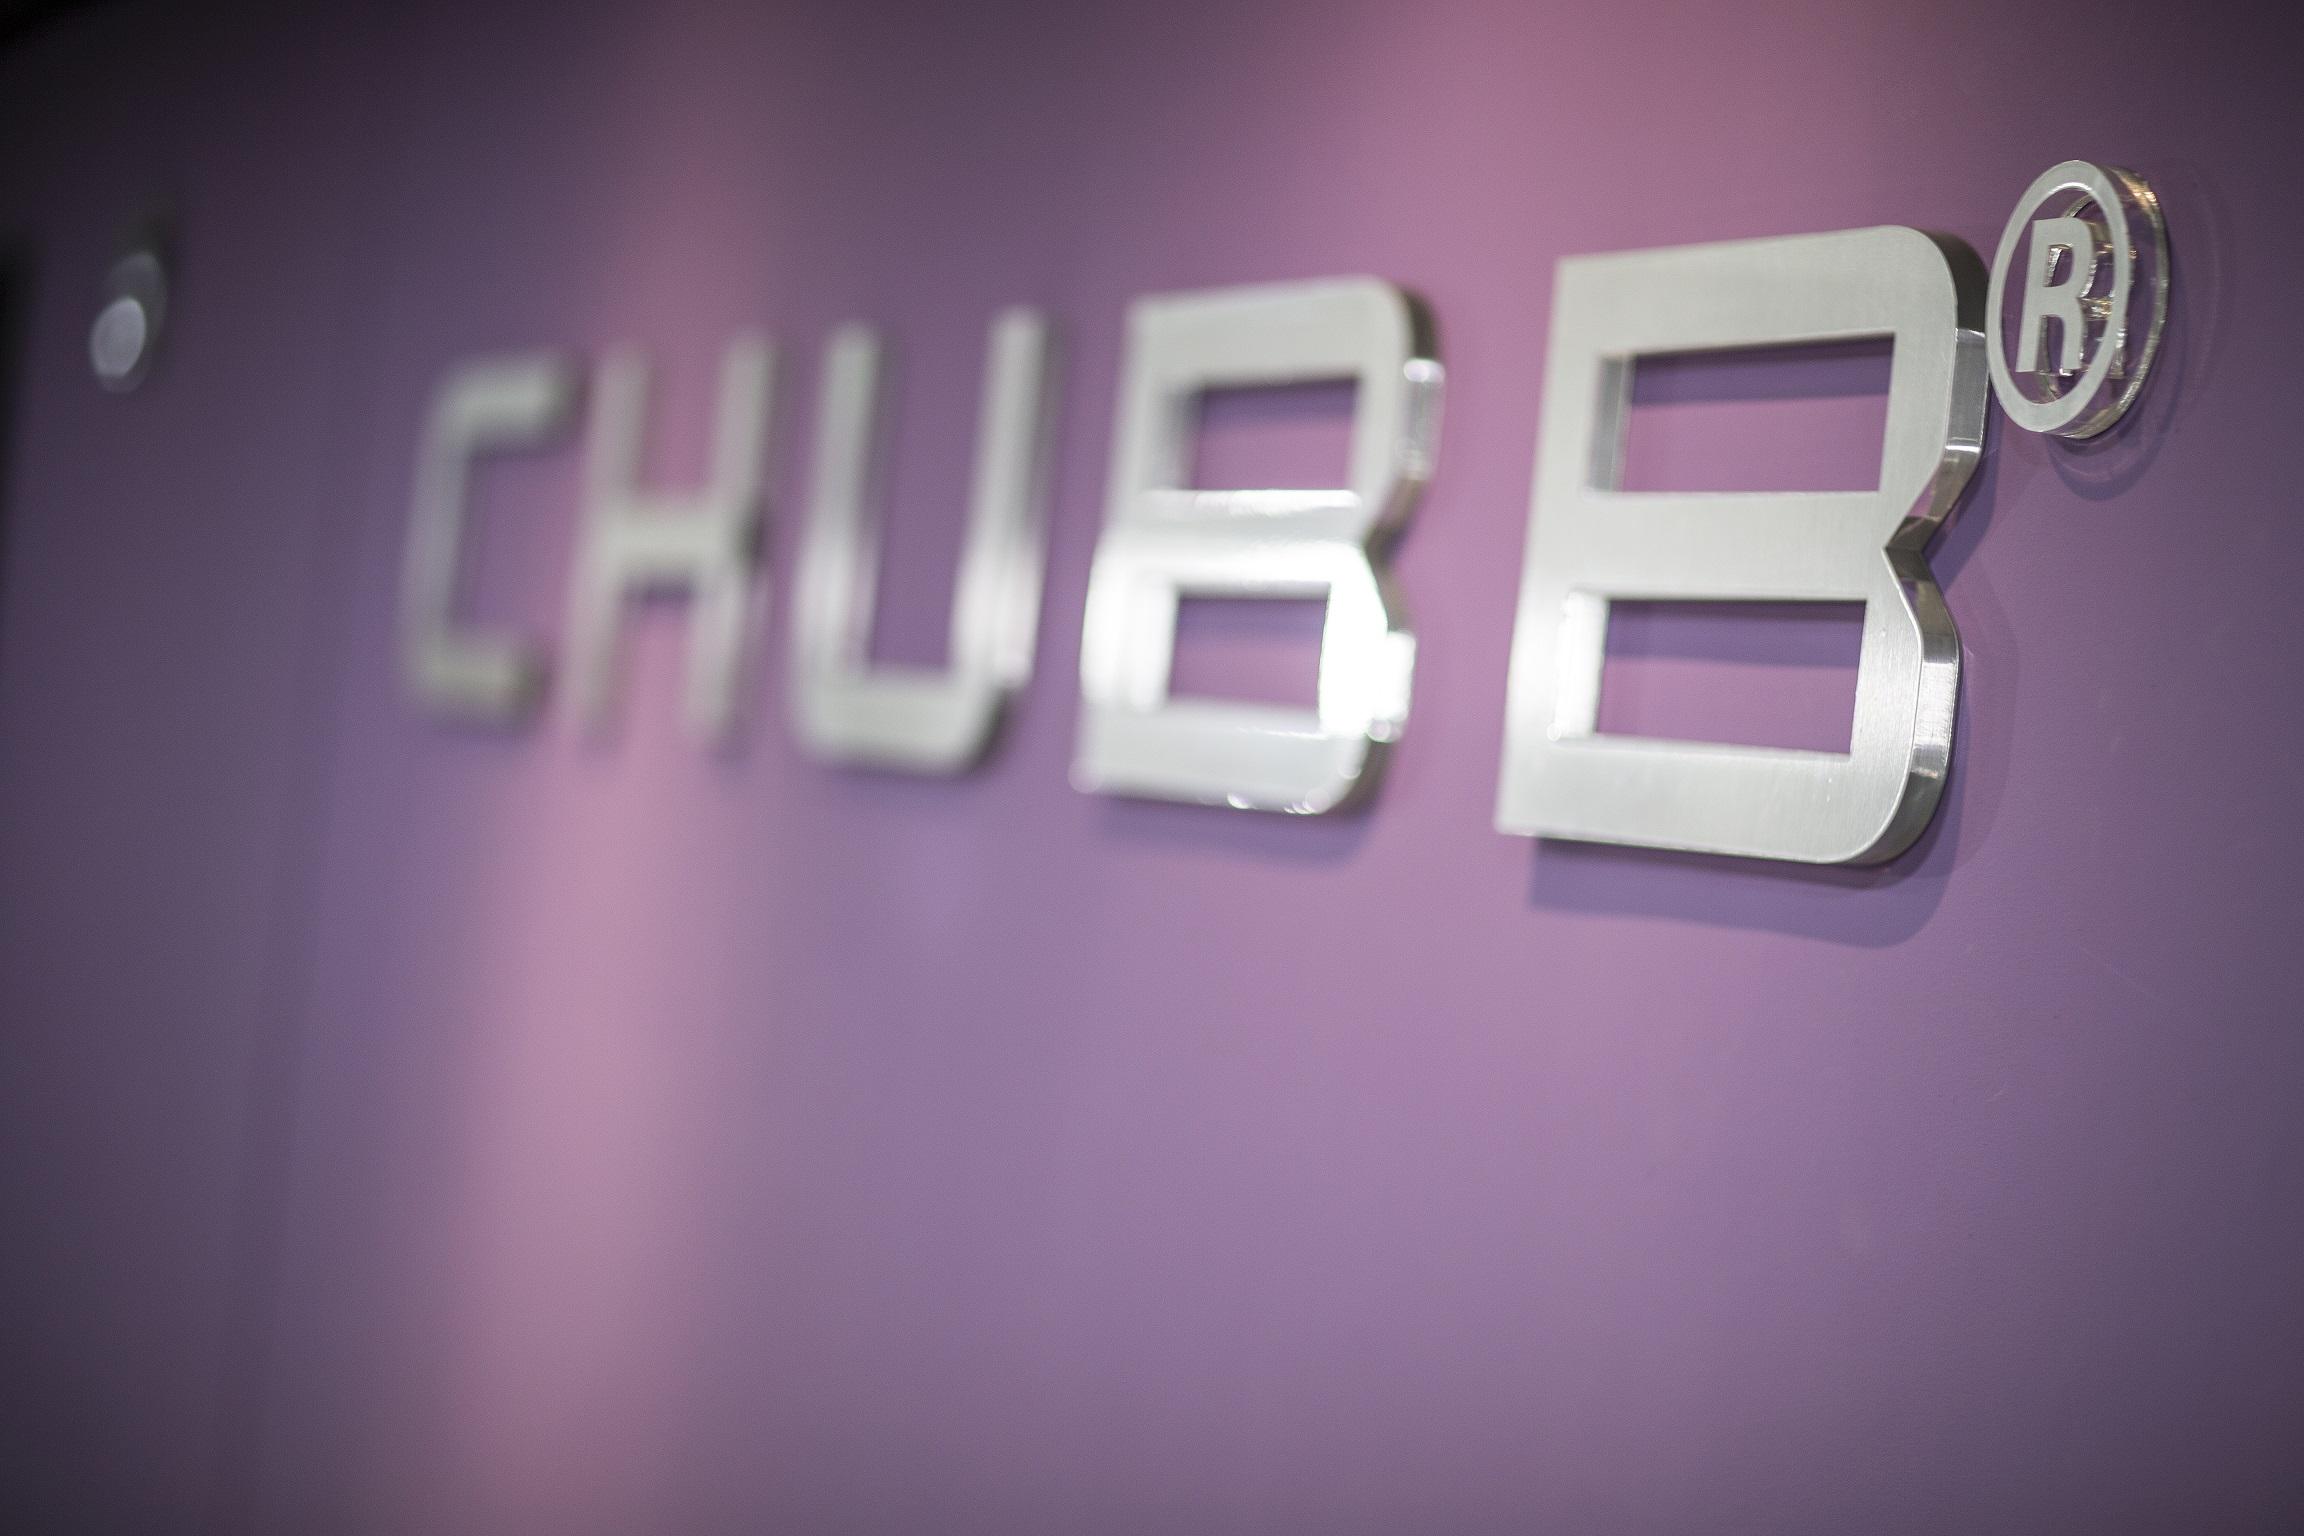 Chubb logo on a wall